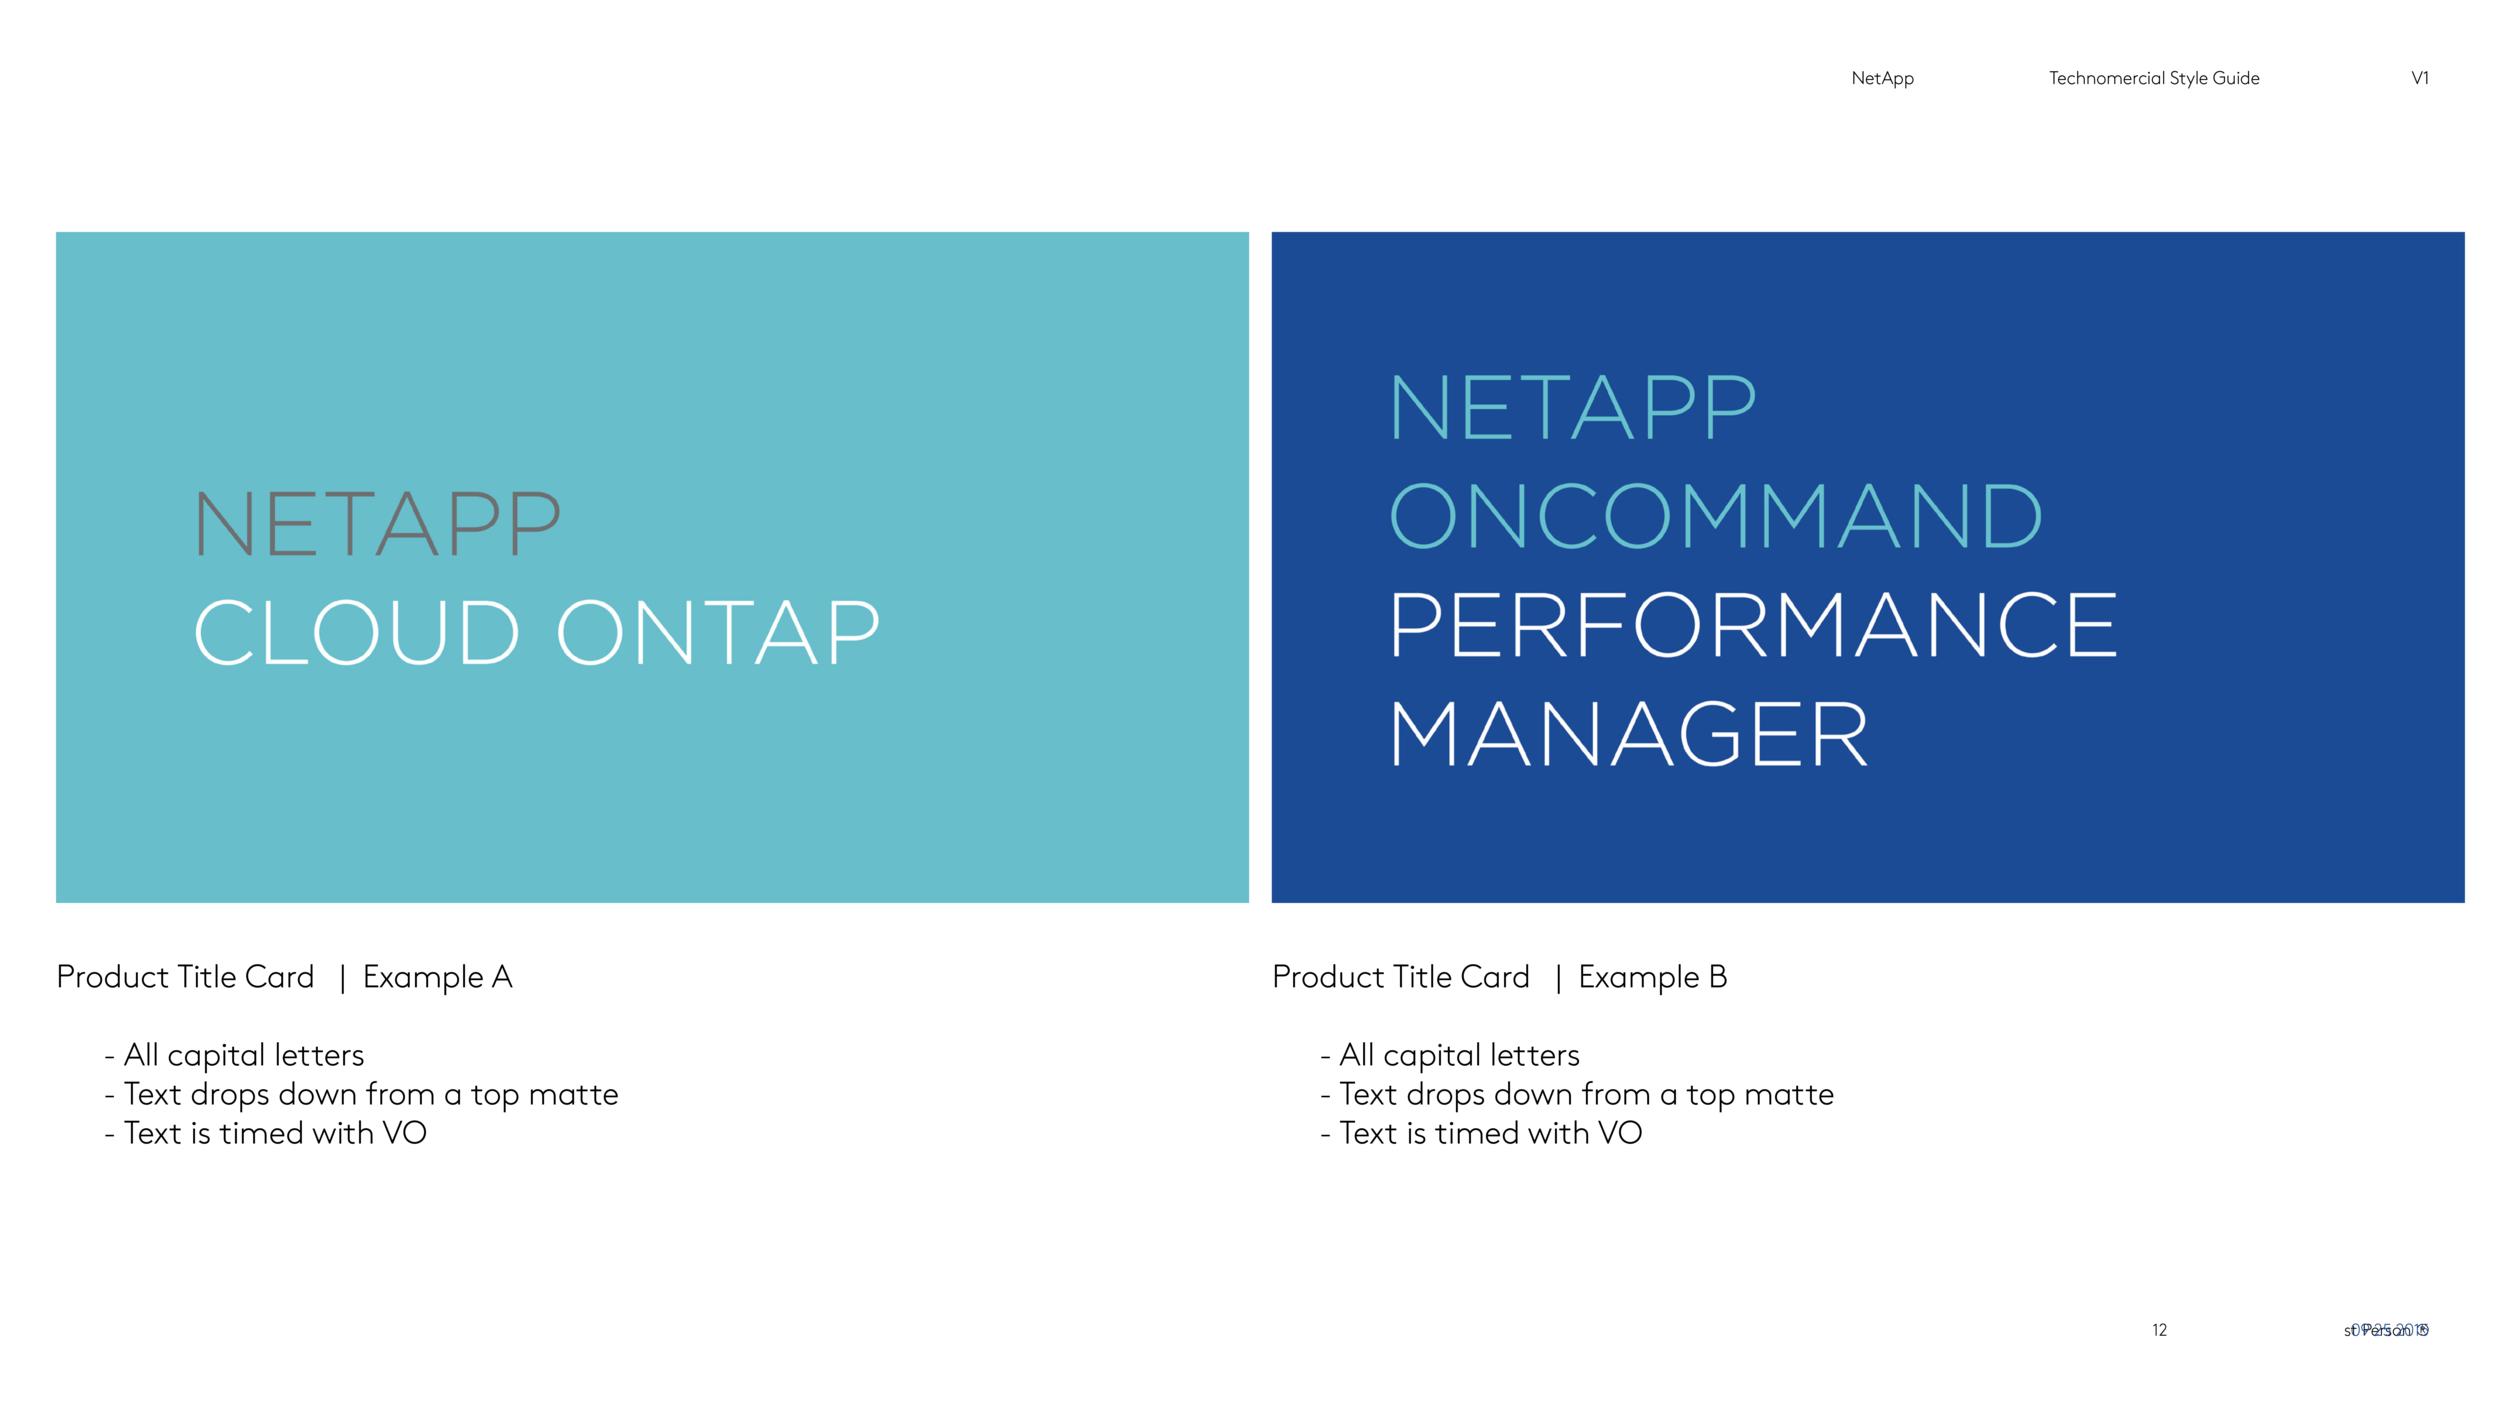 NetApp_Technomercial_Guidelines_01-12.png